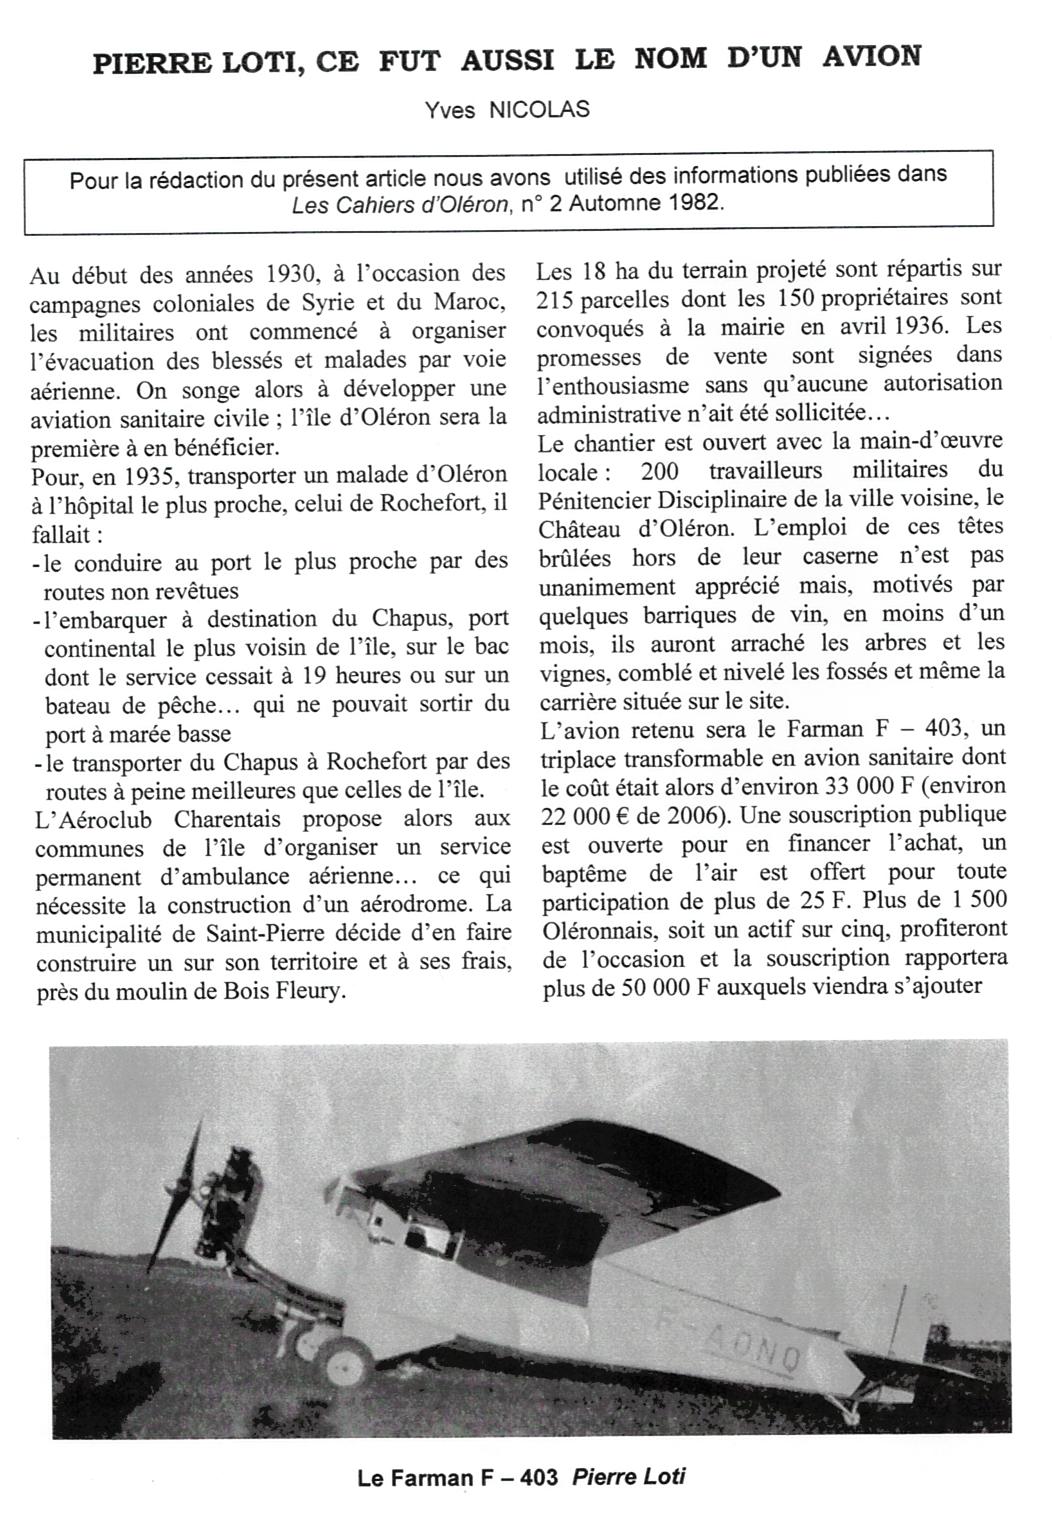 Le Pierre Loti-avion 1